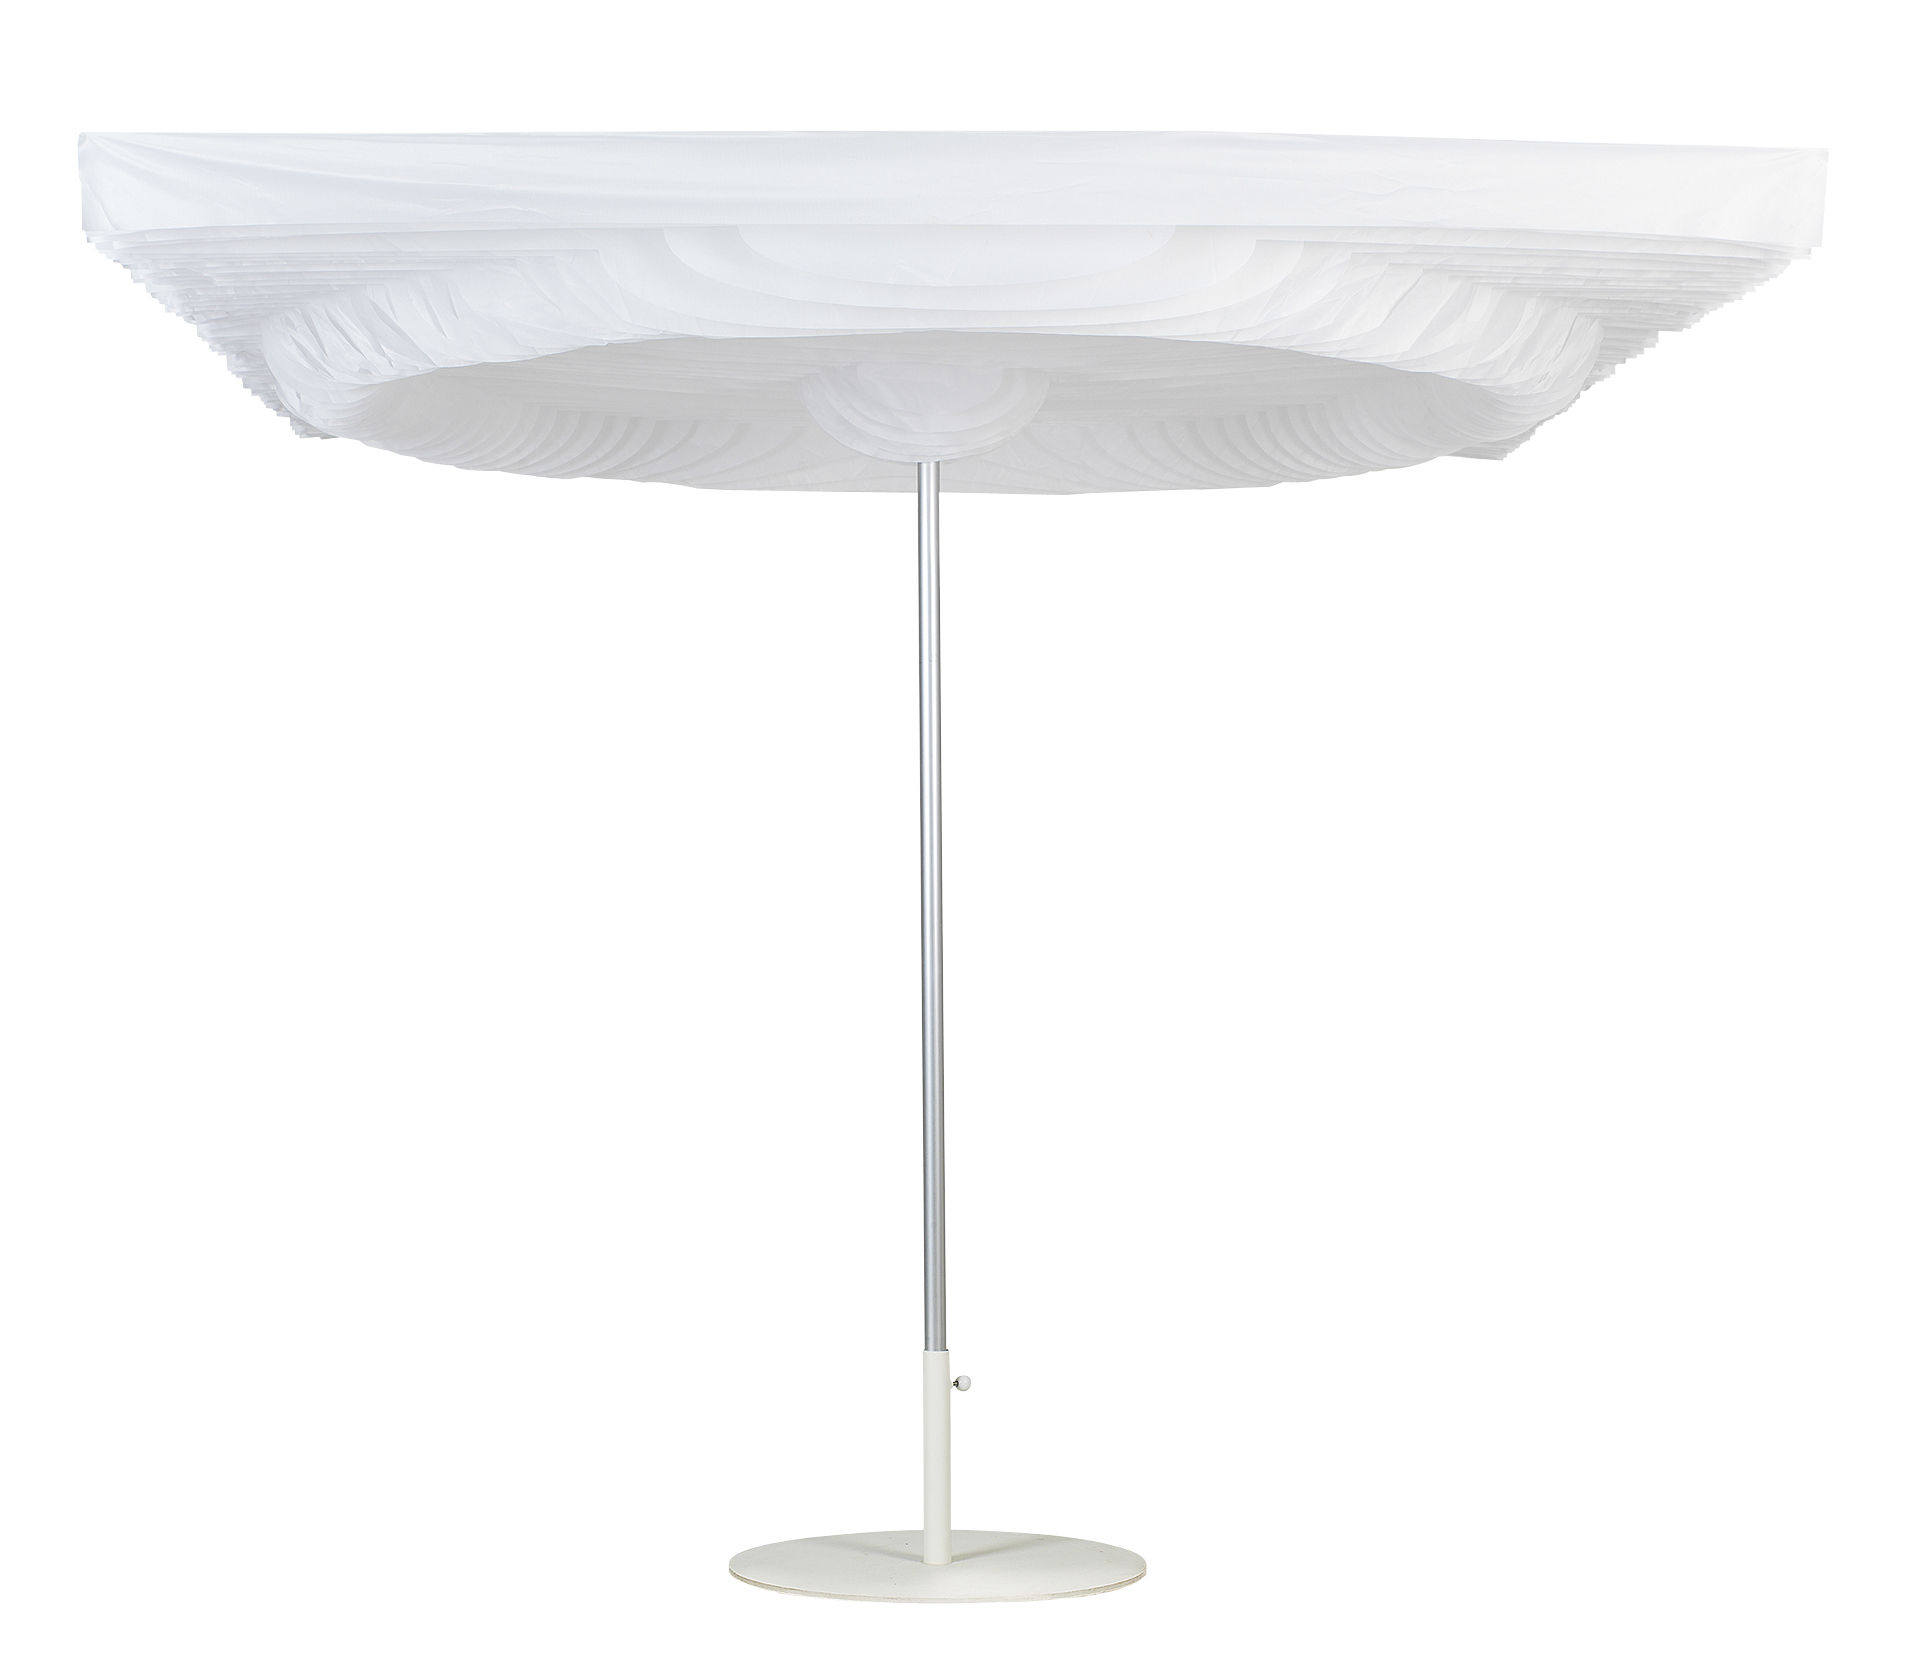 Outdoor - Parasols - Parasol Twister / 250 x 250 cm - Symo - Blanc - Acrylique, Aluminium, Polyester, PVC